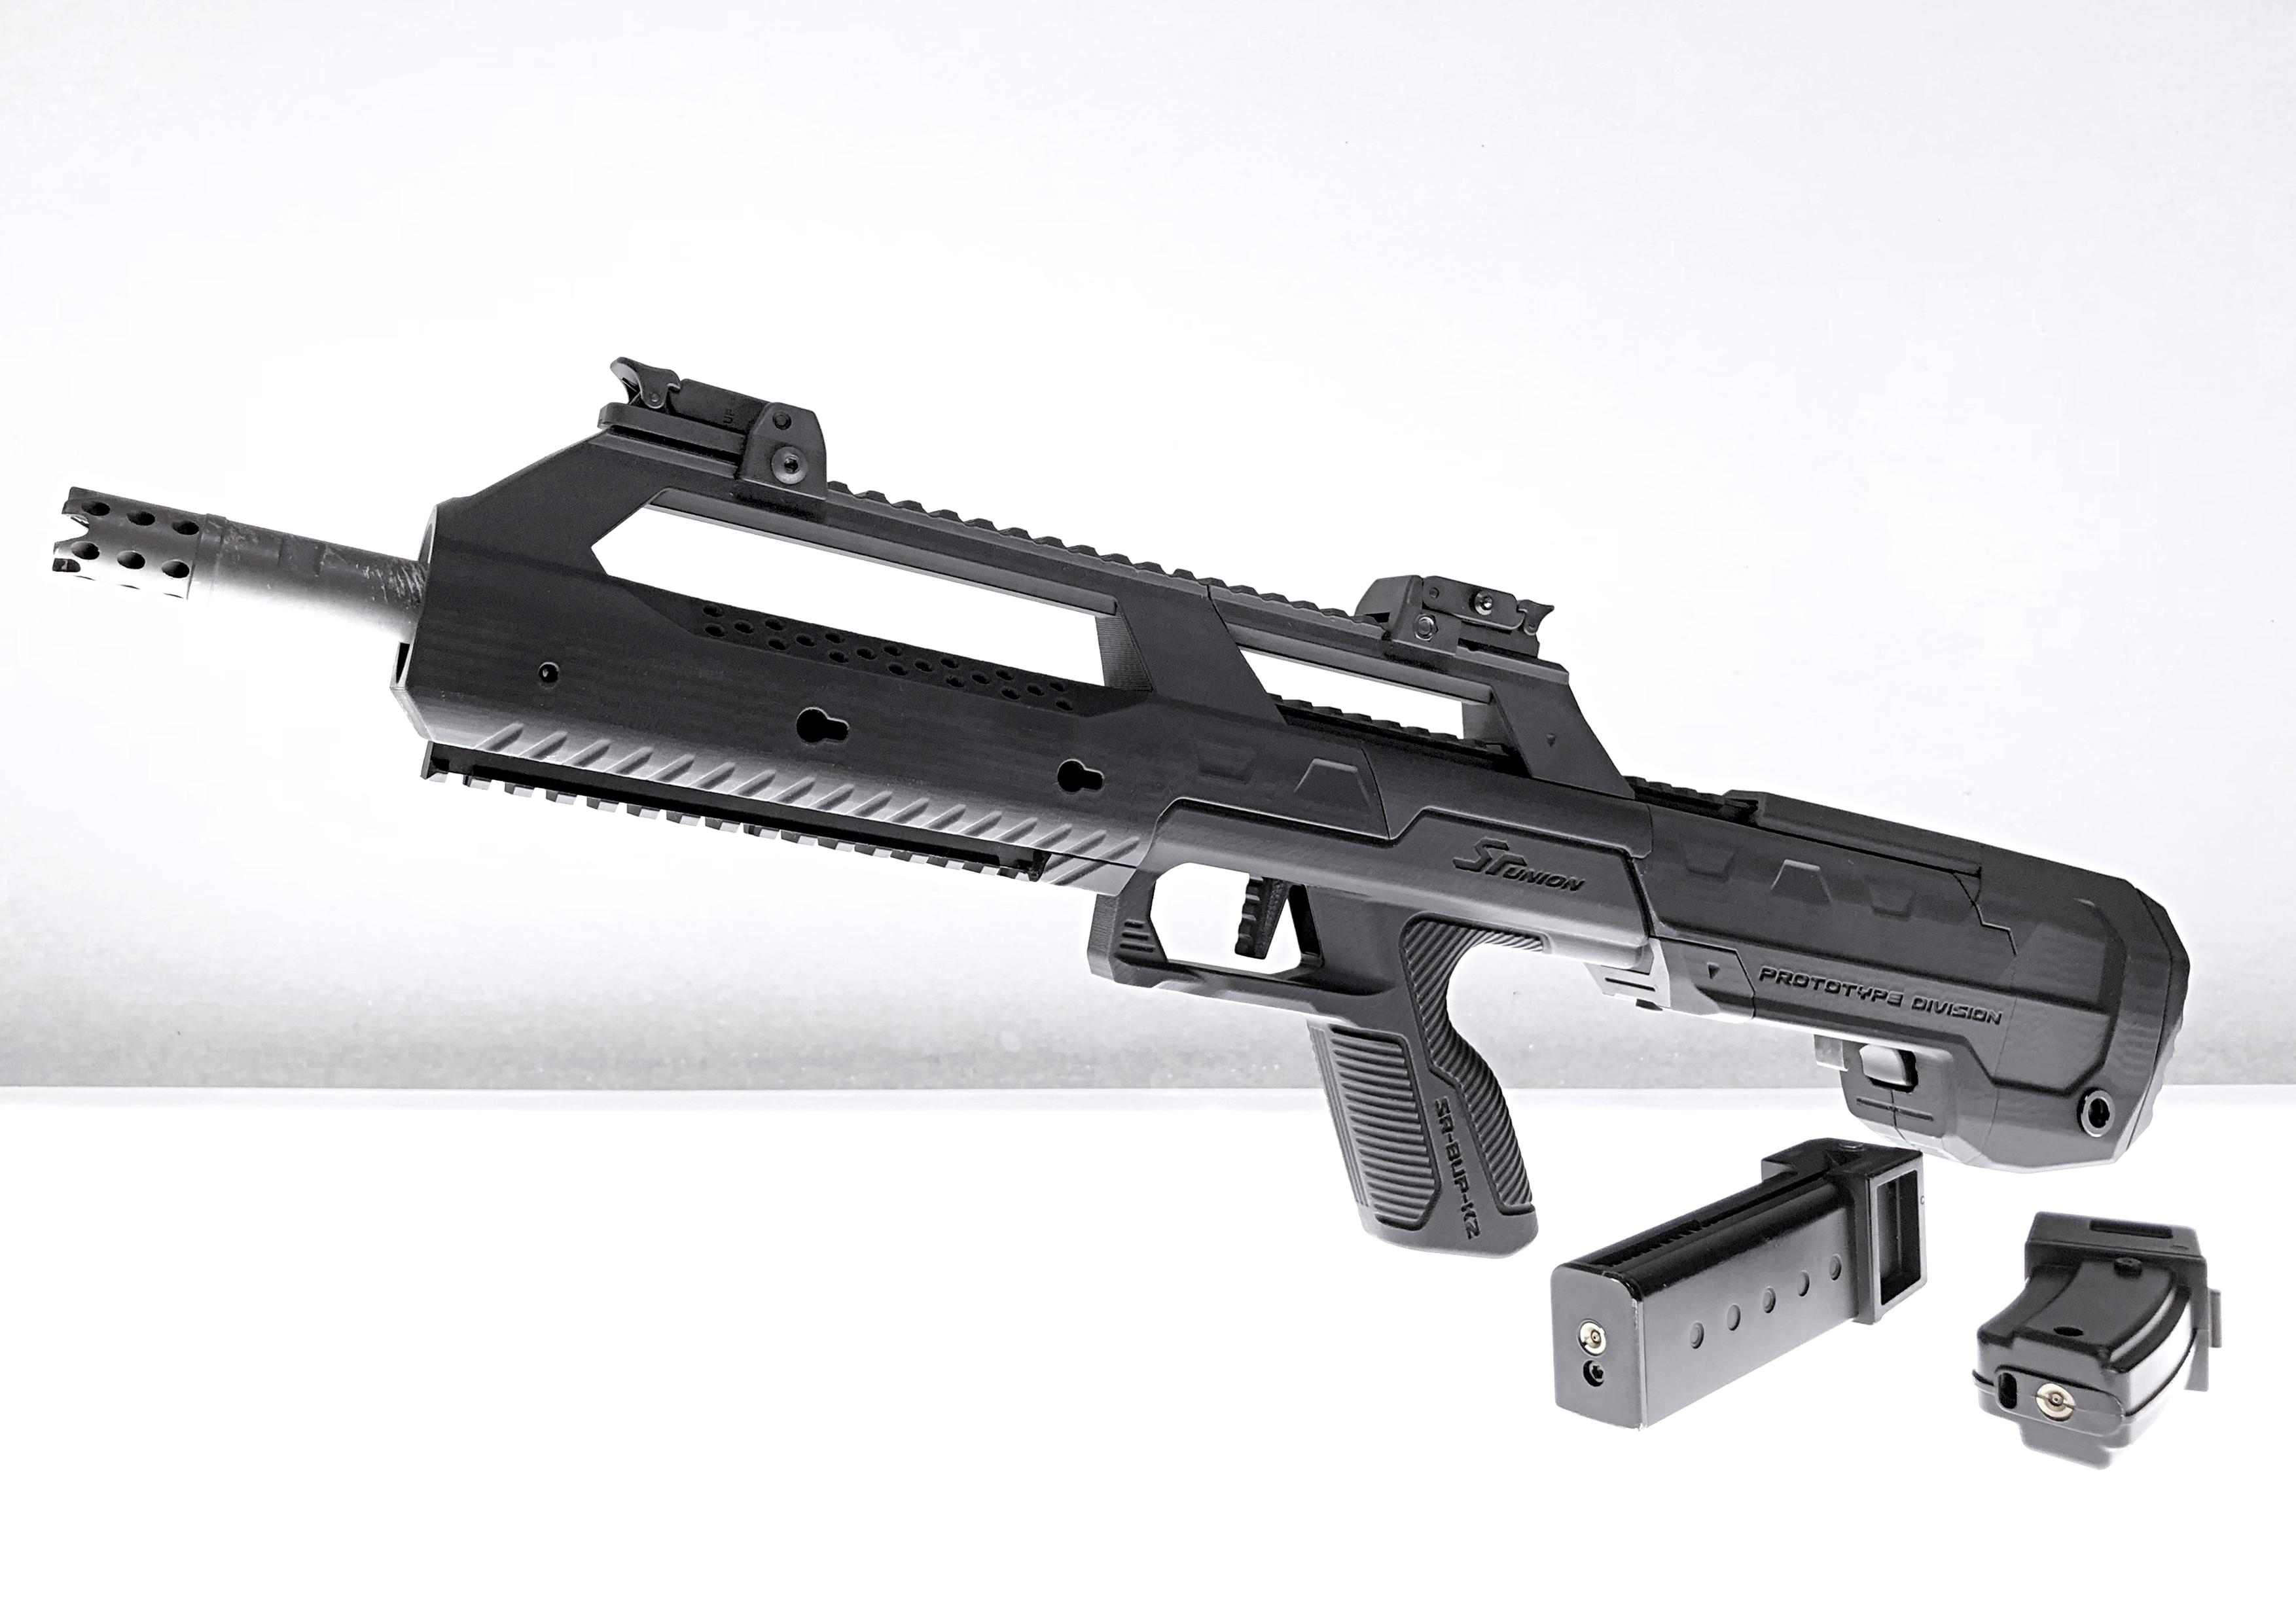 K2 02